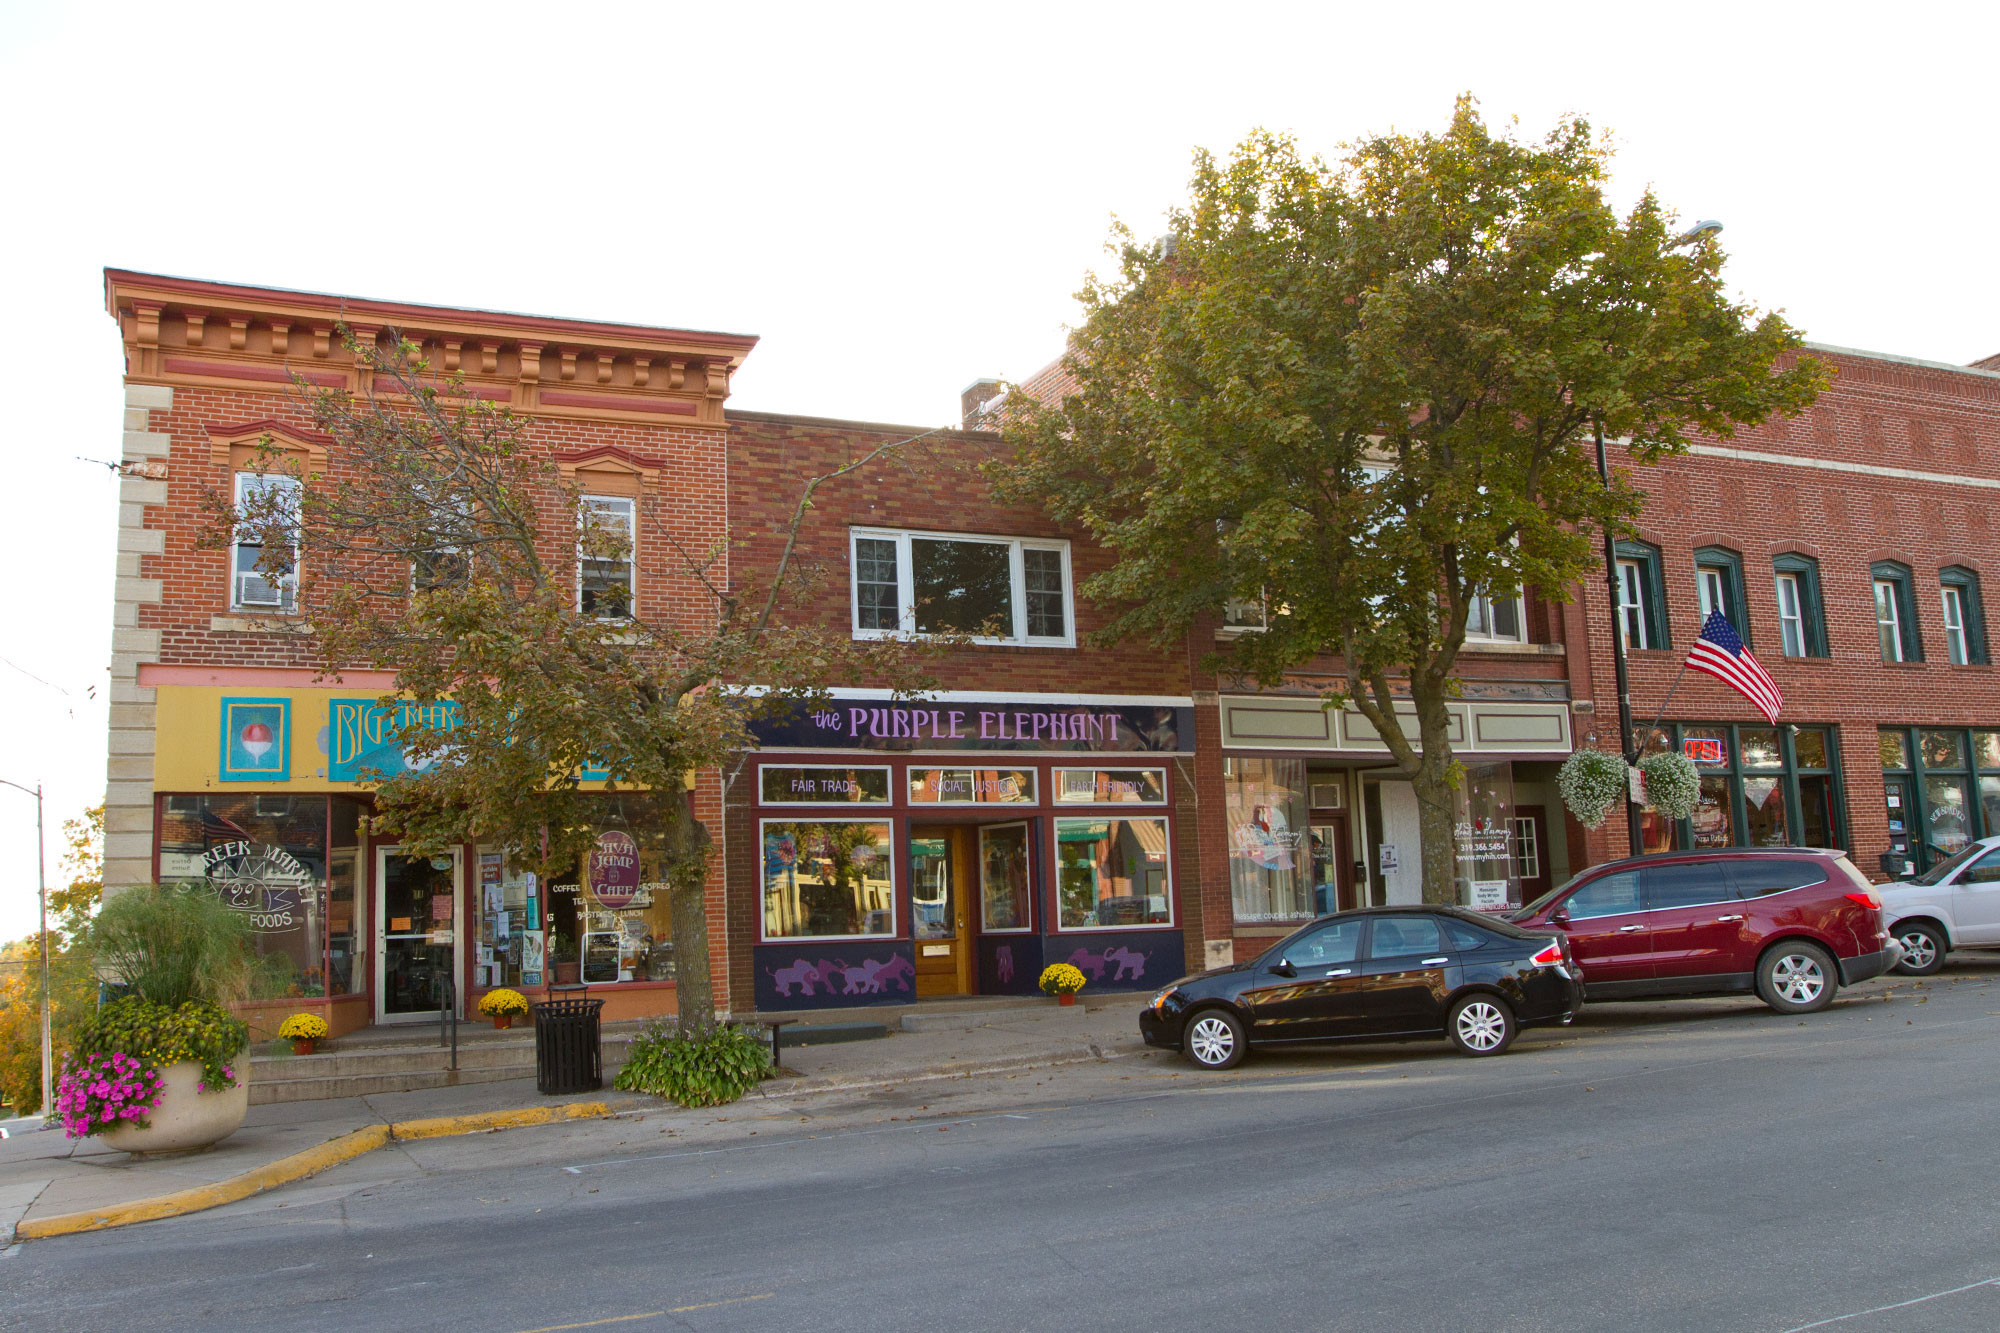 Mount Vernon Commercial district